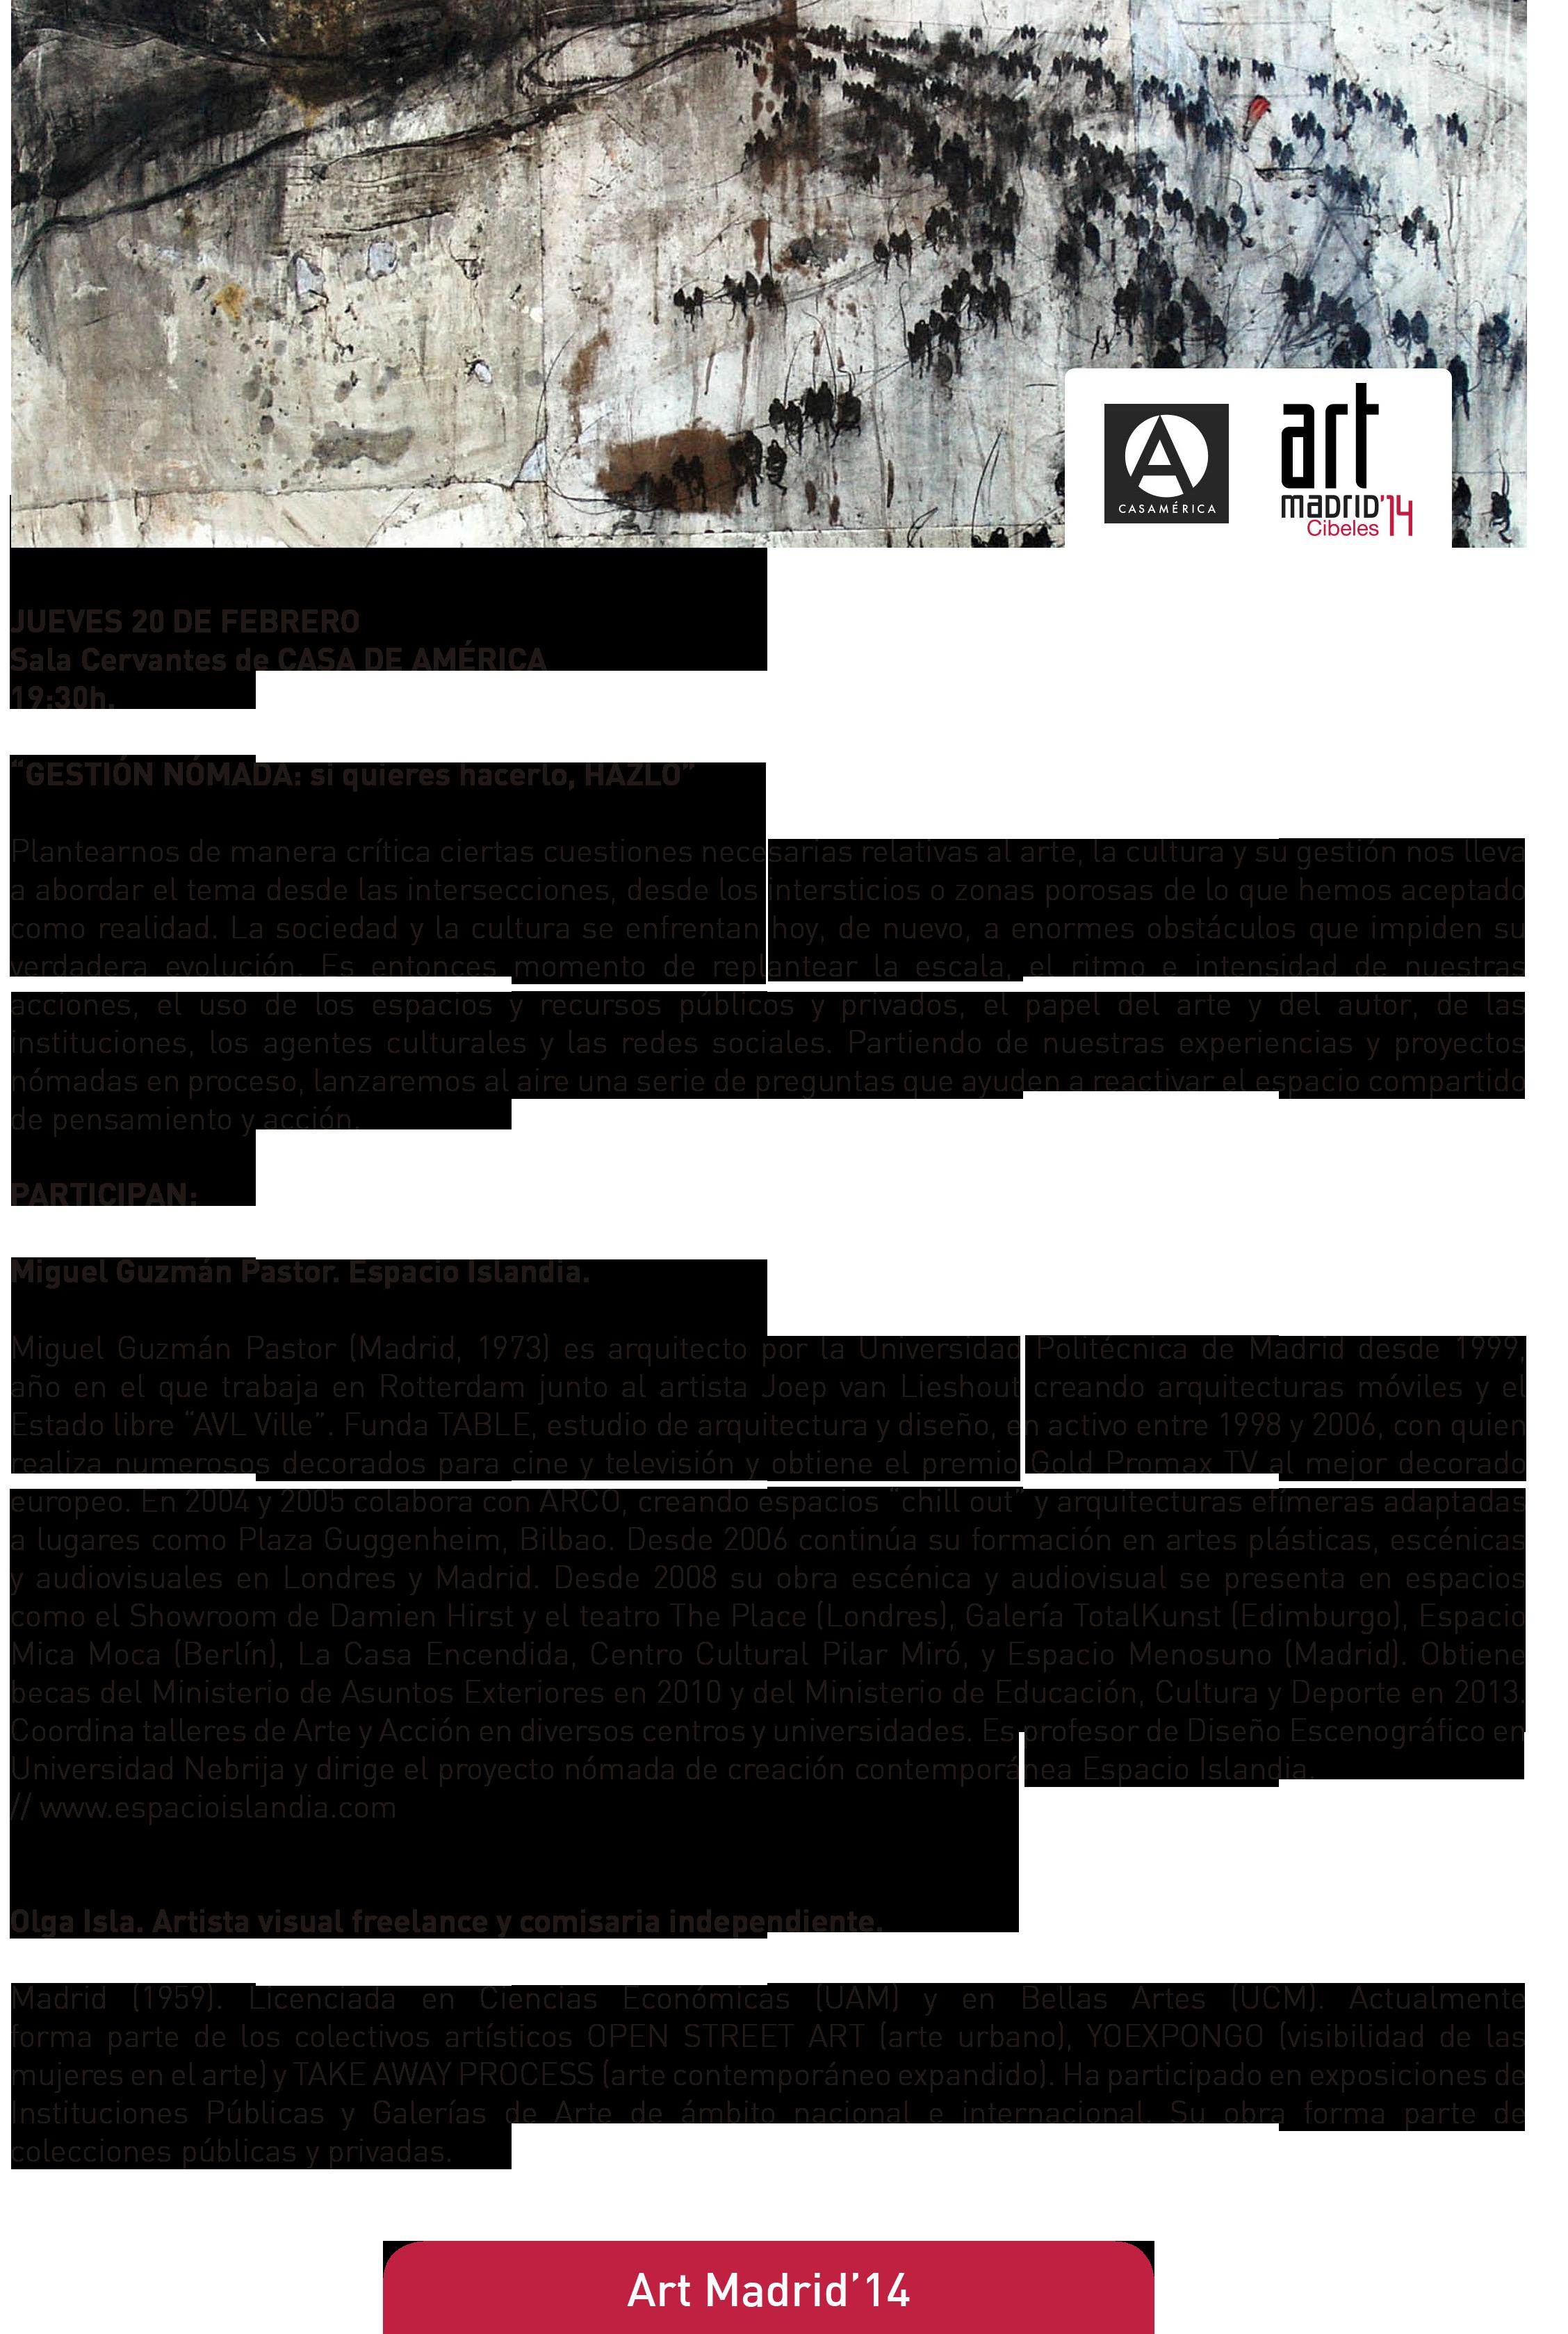 4_nota-prensa-casa-america-art-madrid-contemporaneo-charlas-3.png